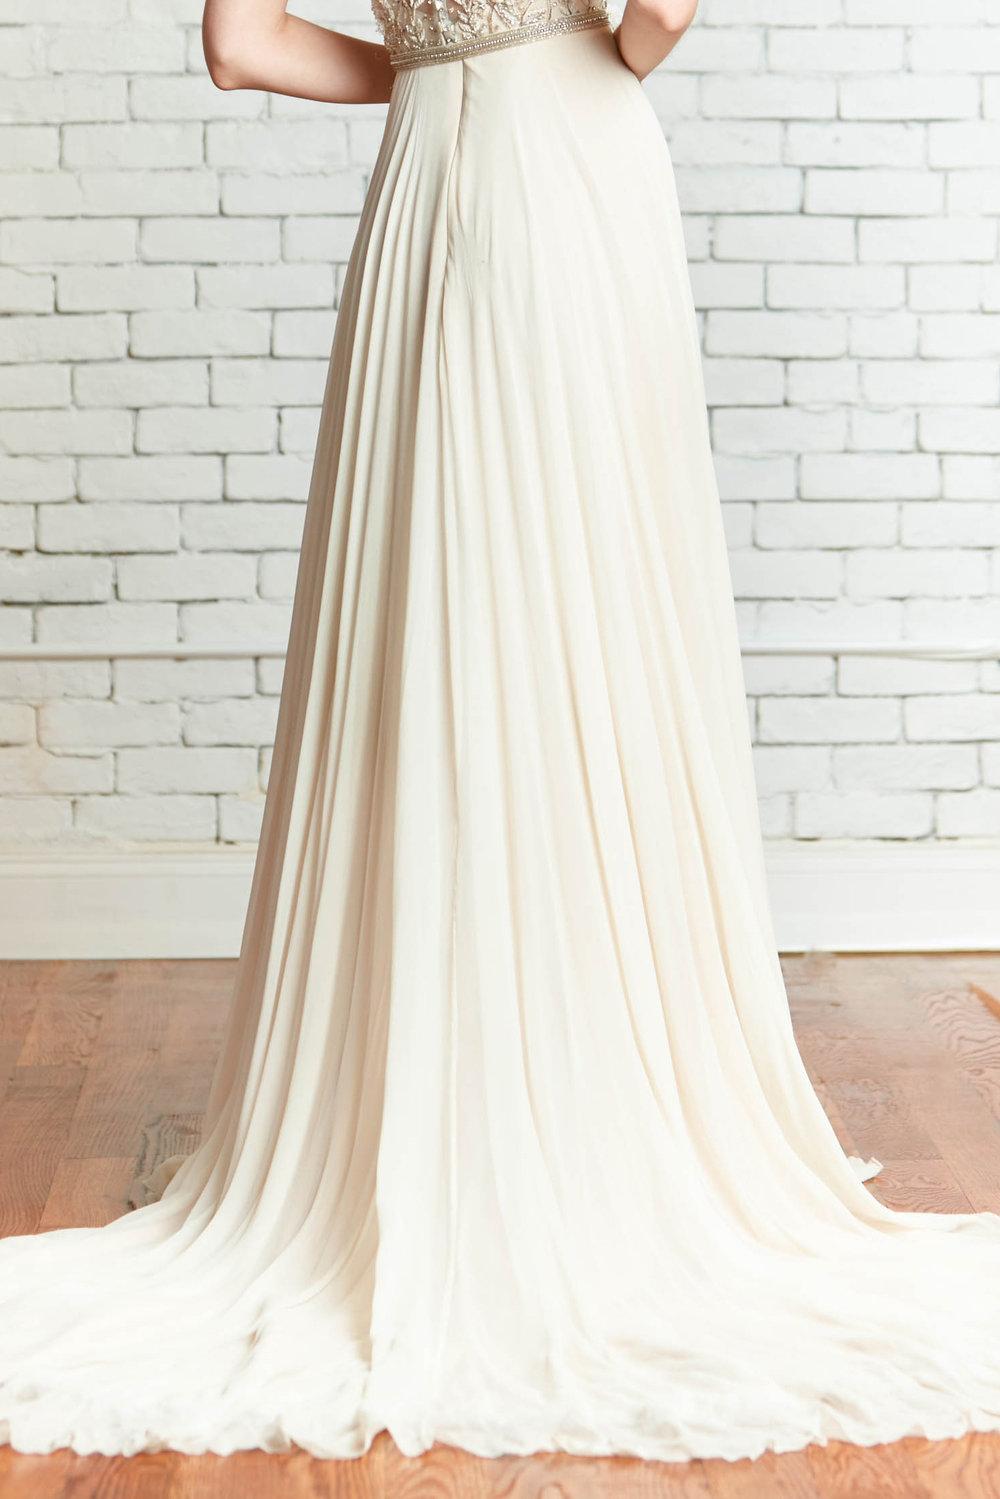 Sage_2back-Chiffon_Circle_Skirt_Romantic_Wedding_Separate.jpg